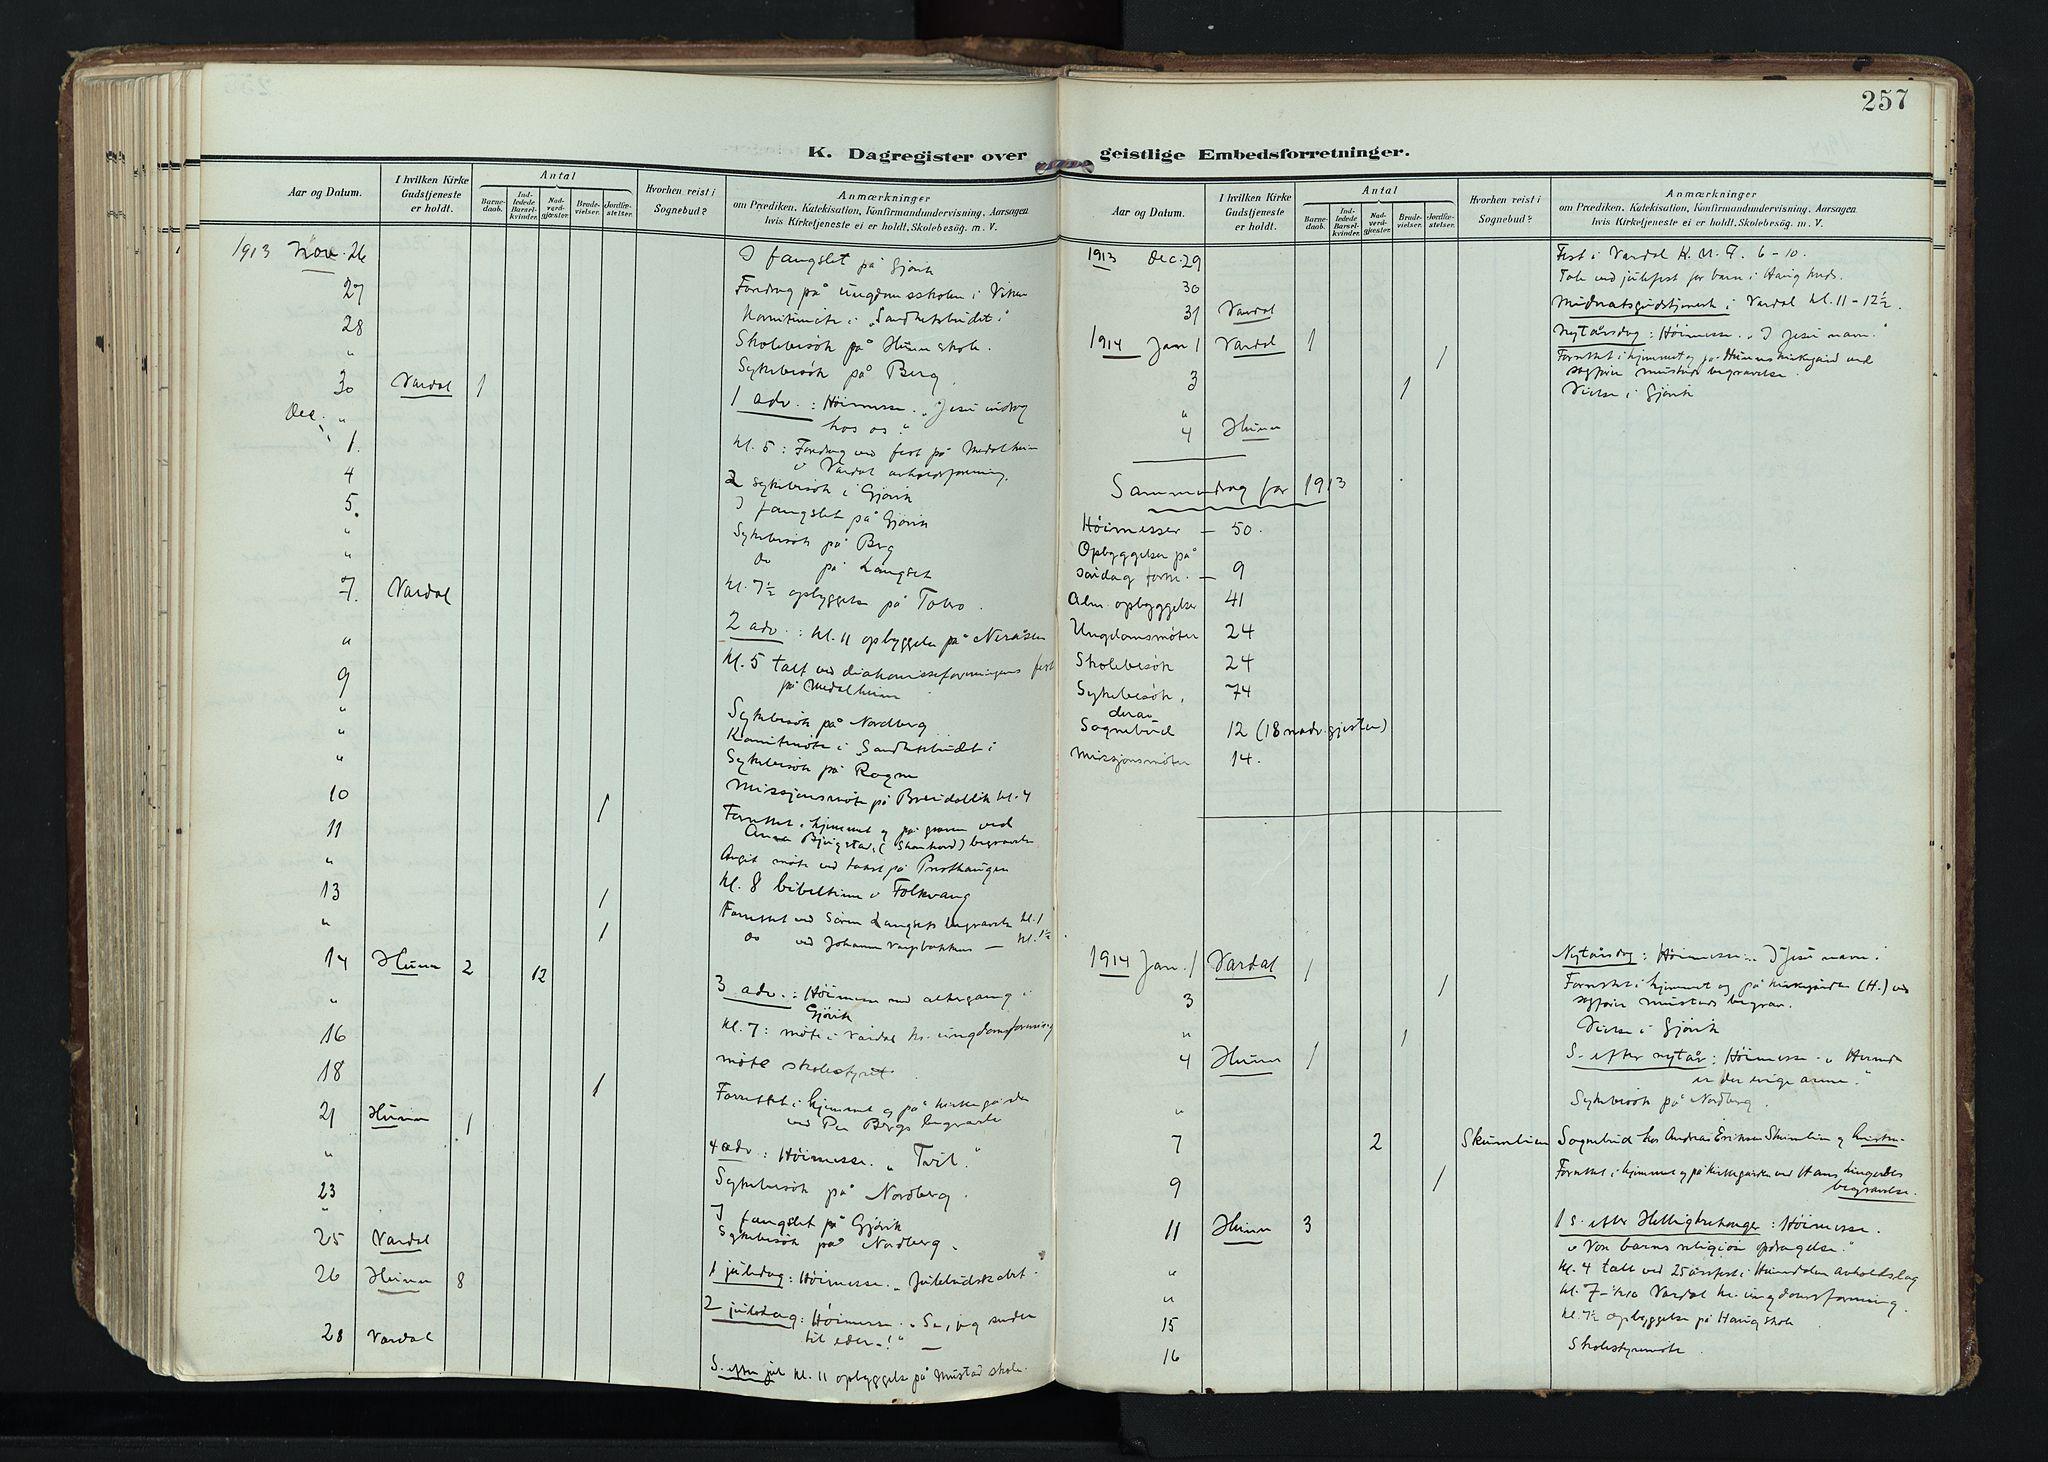 SAH, Vardal prestekontor, H/Ha/Haa/L0020: Ministerialbok nr. 20, 1907-1921, s. 257